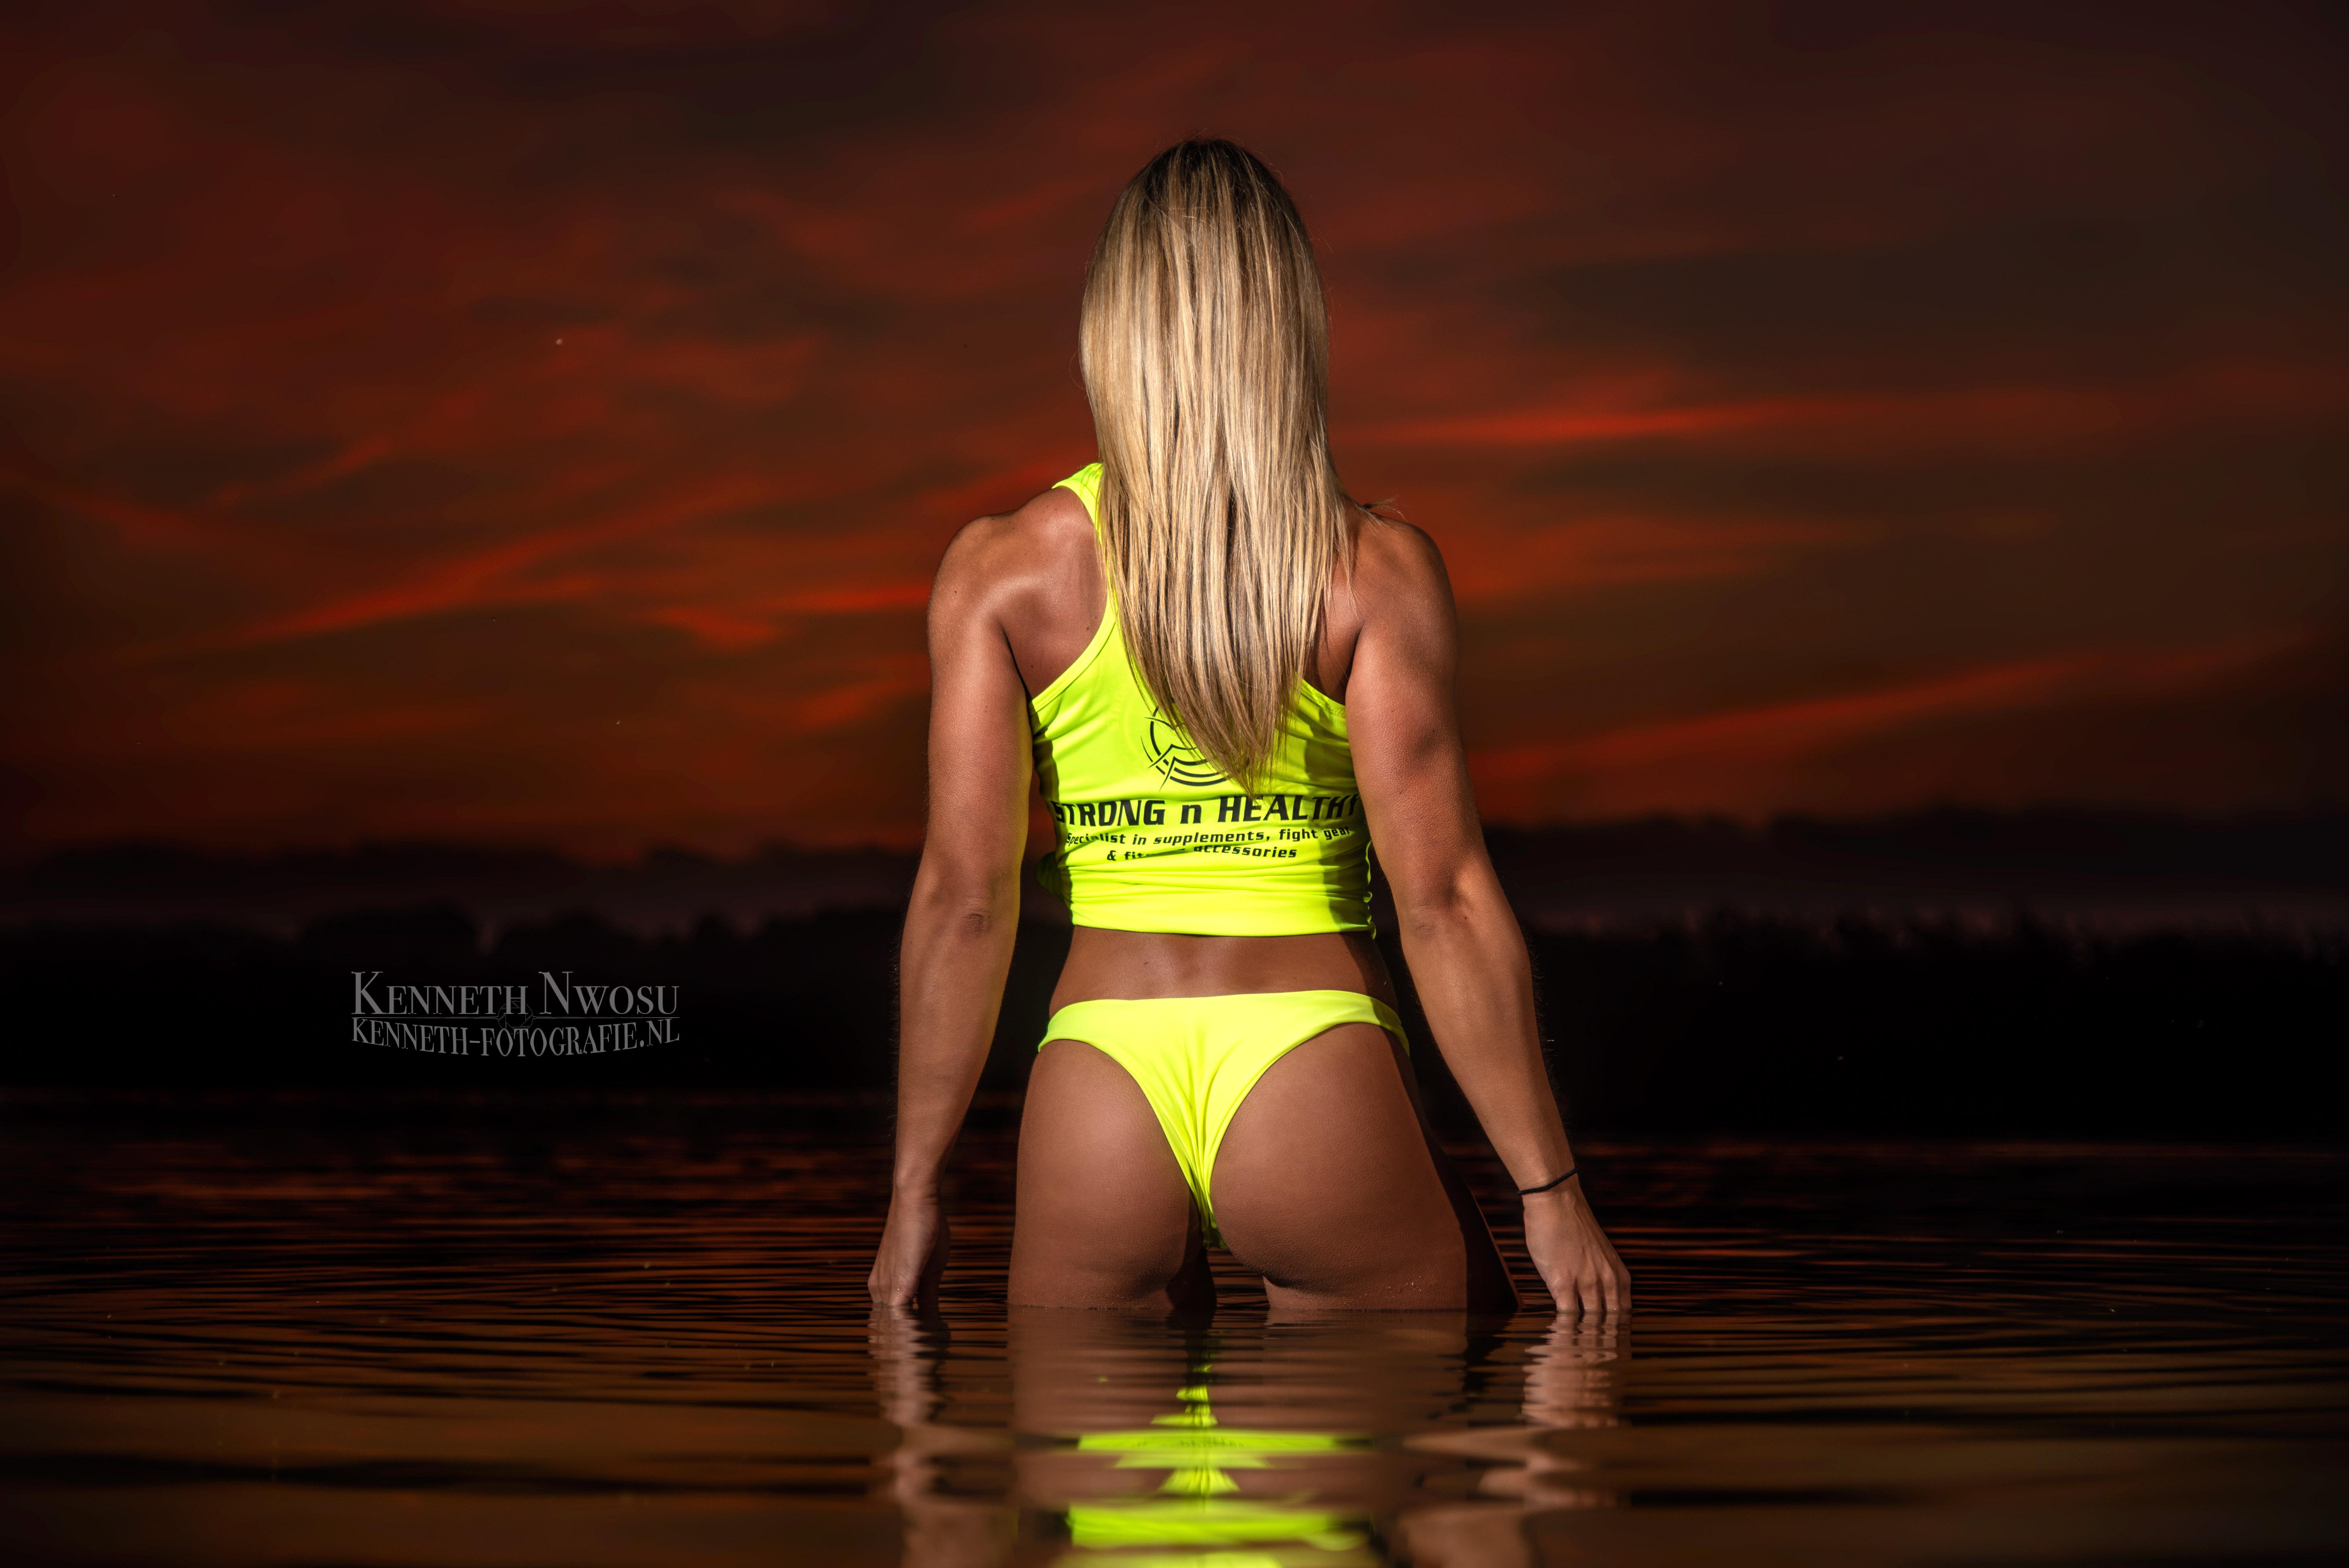 Fitness on the beach shoot met Samantha